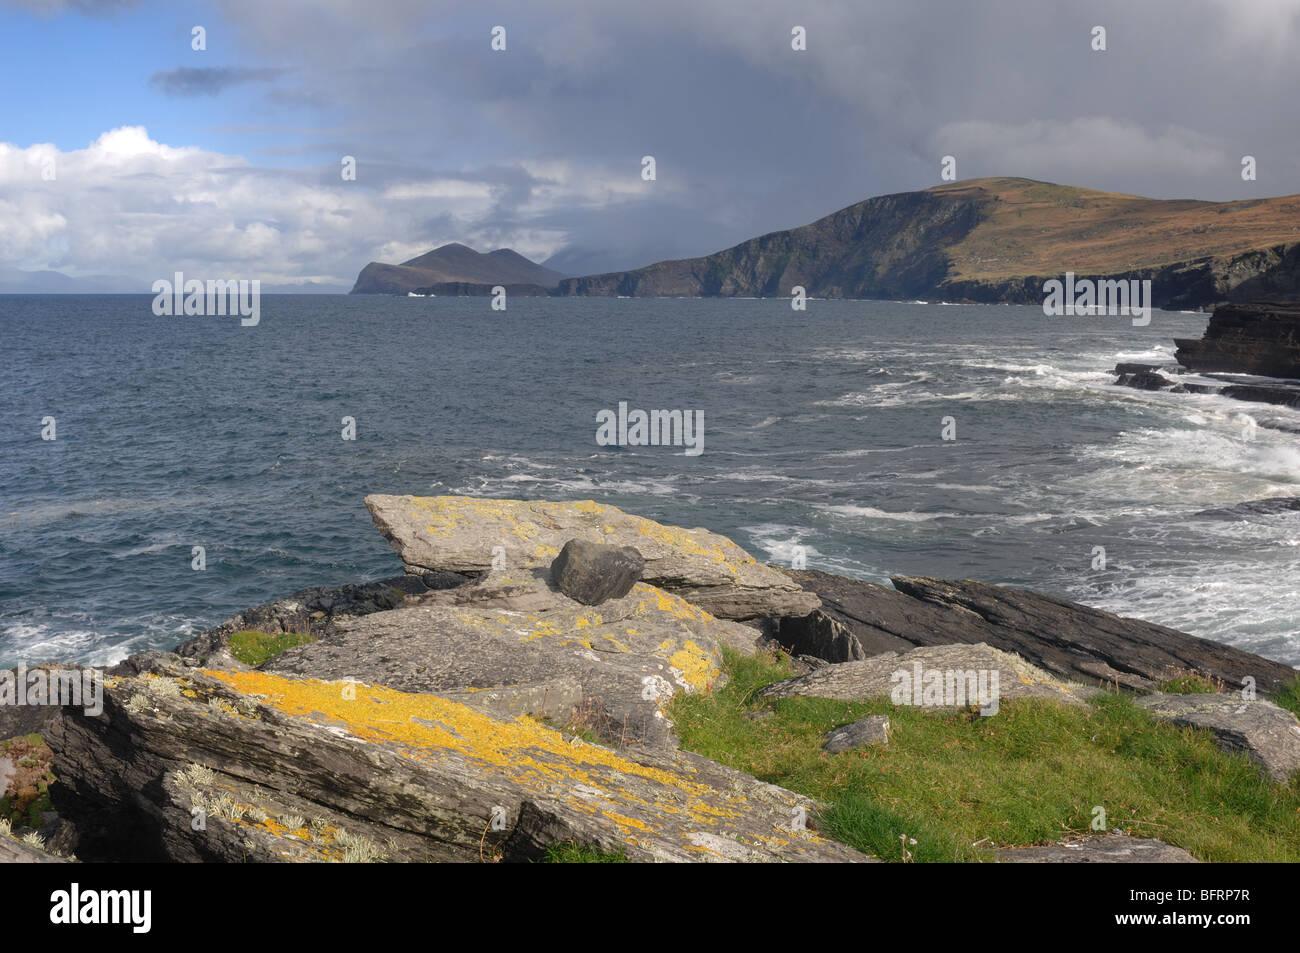 Irish Coast - Stock Image